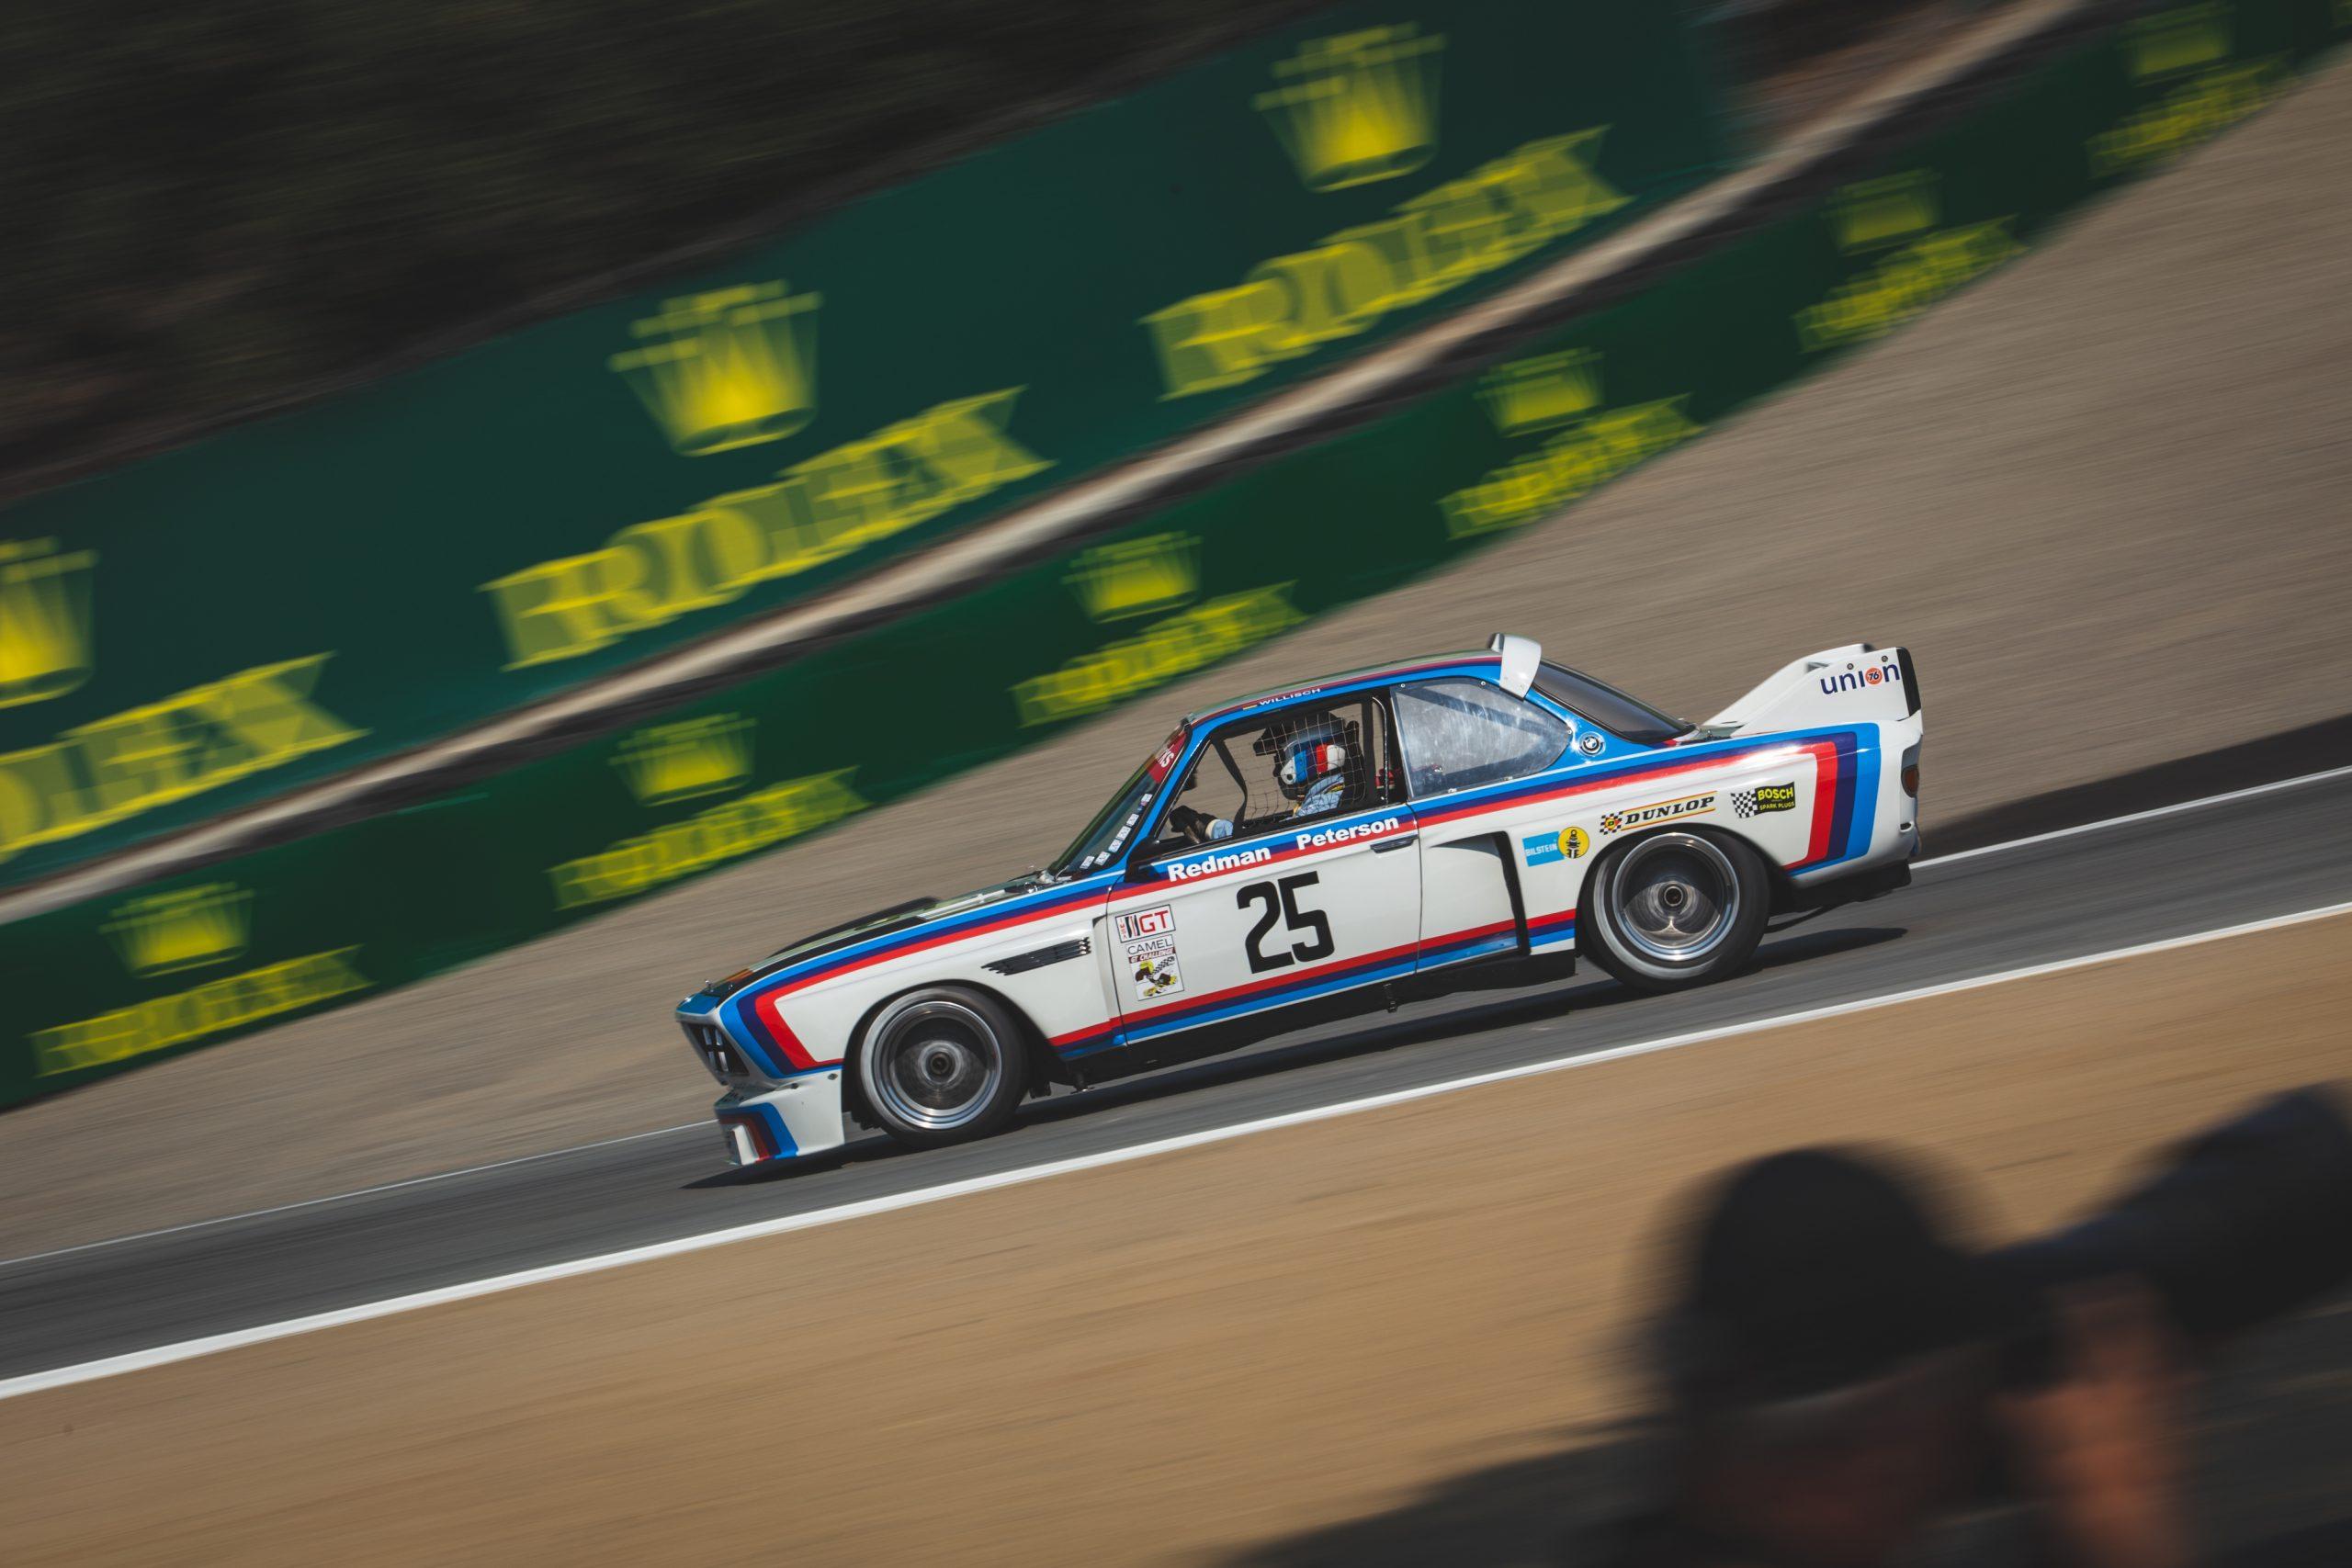 Laguna Seca BMW 3.0 CSL Batmobile track driving